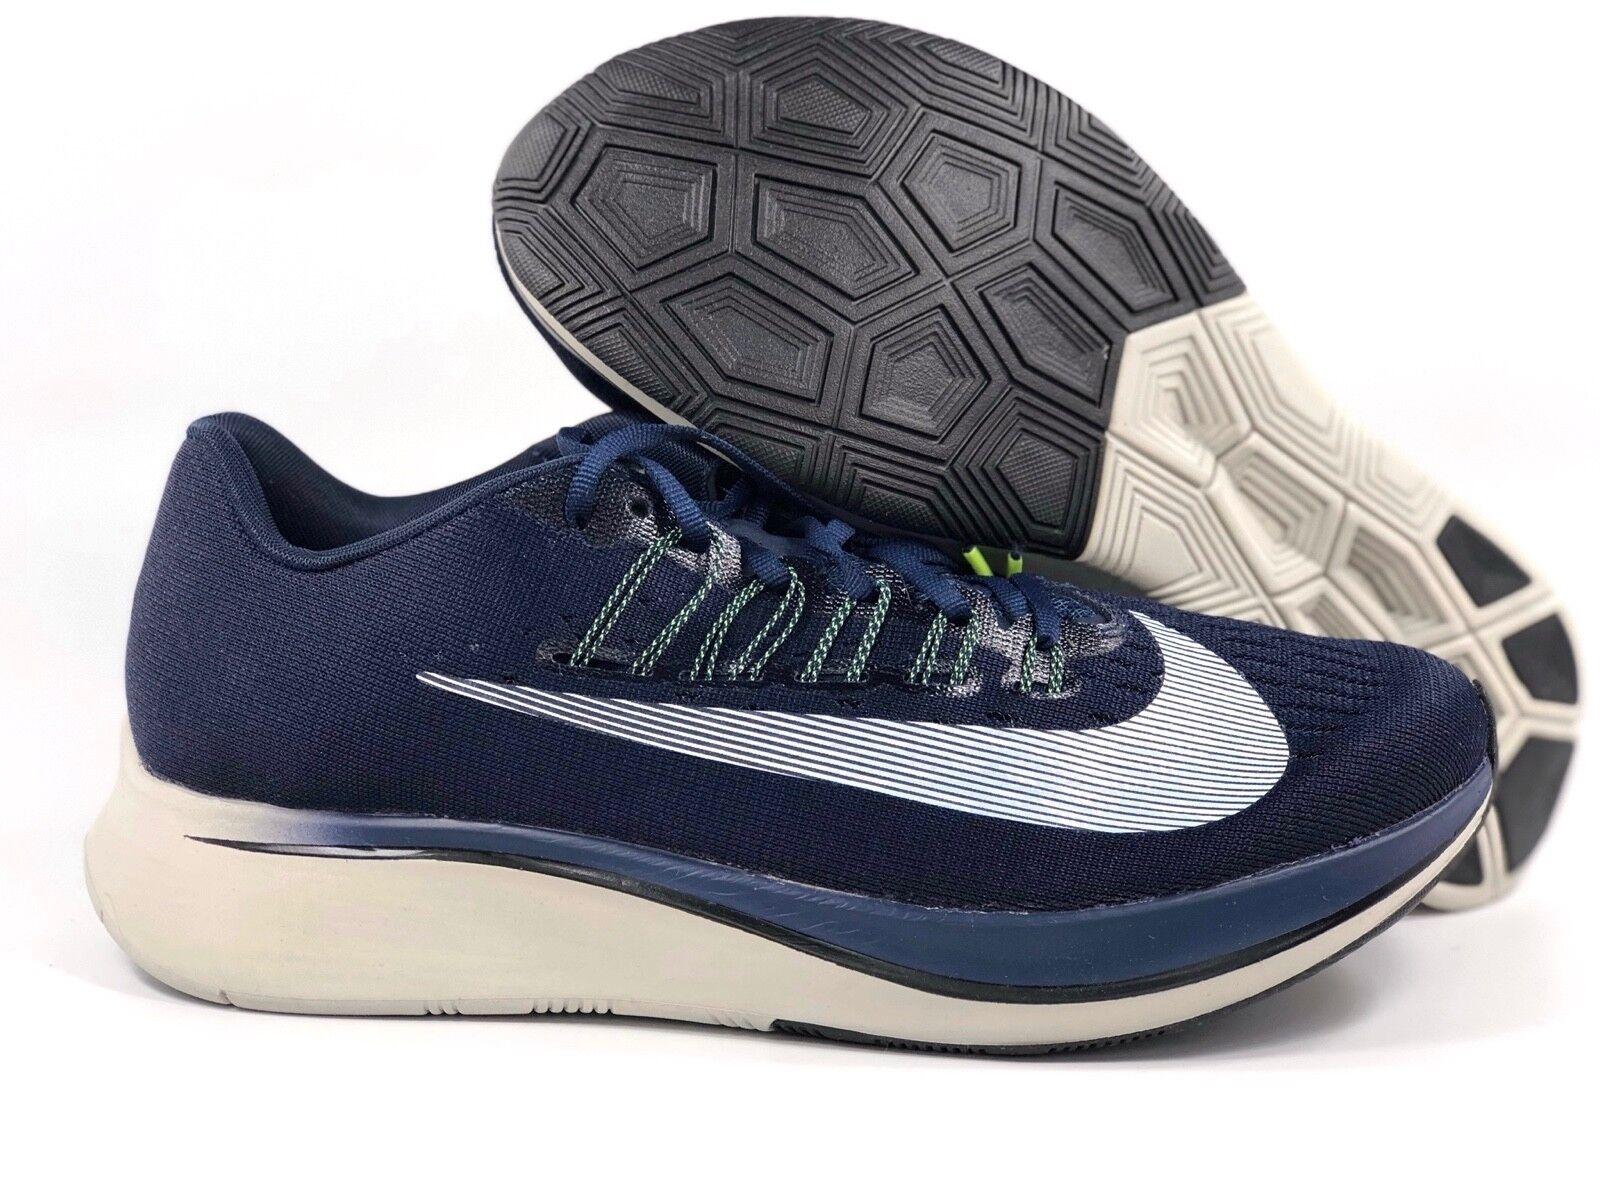 Nike zoom fliegen obsidian navy - blau - navy weiße indigo laufschuhe 880848-405 mens 8 - 13 a6fbd9